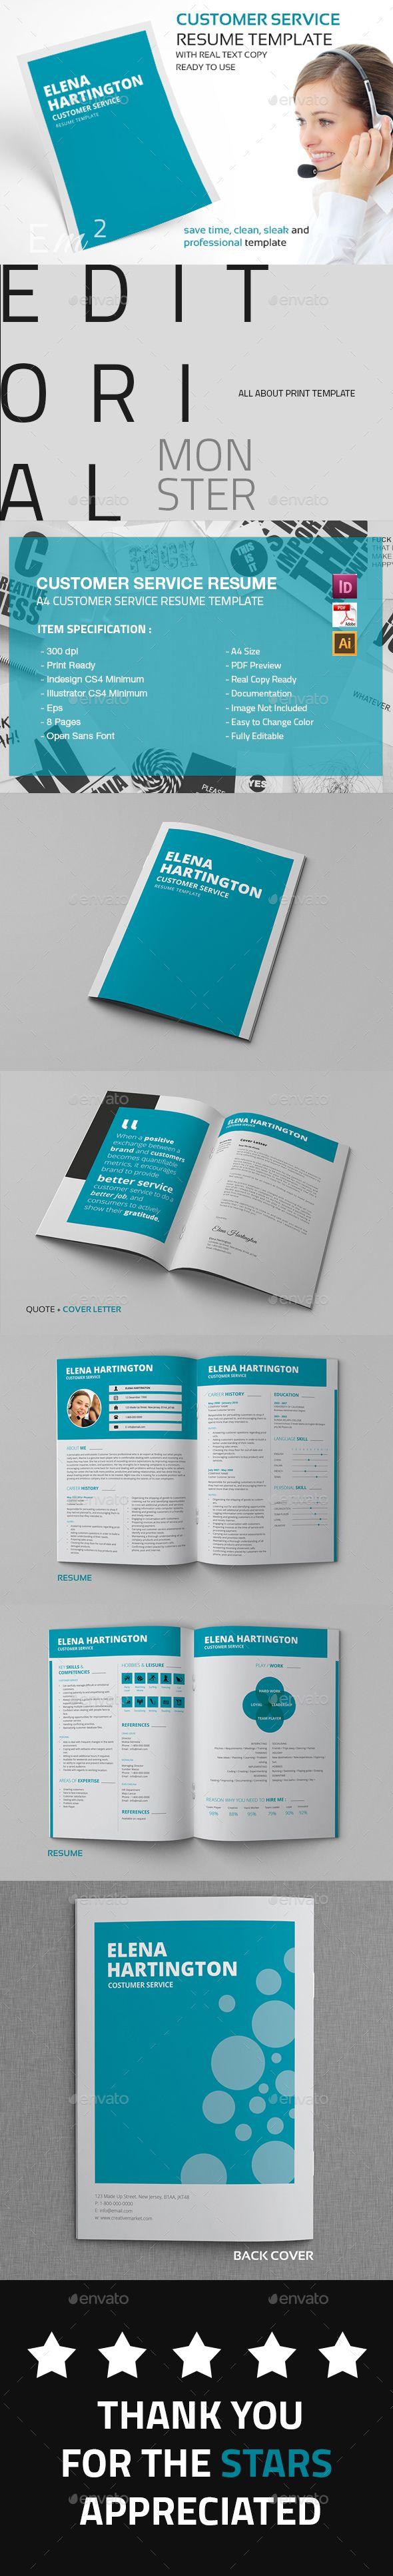 customer relations resume%0A Customer Service Resume CV Template